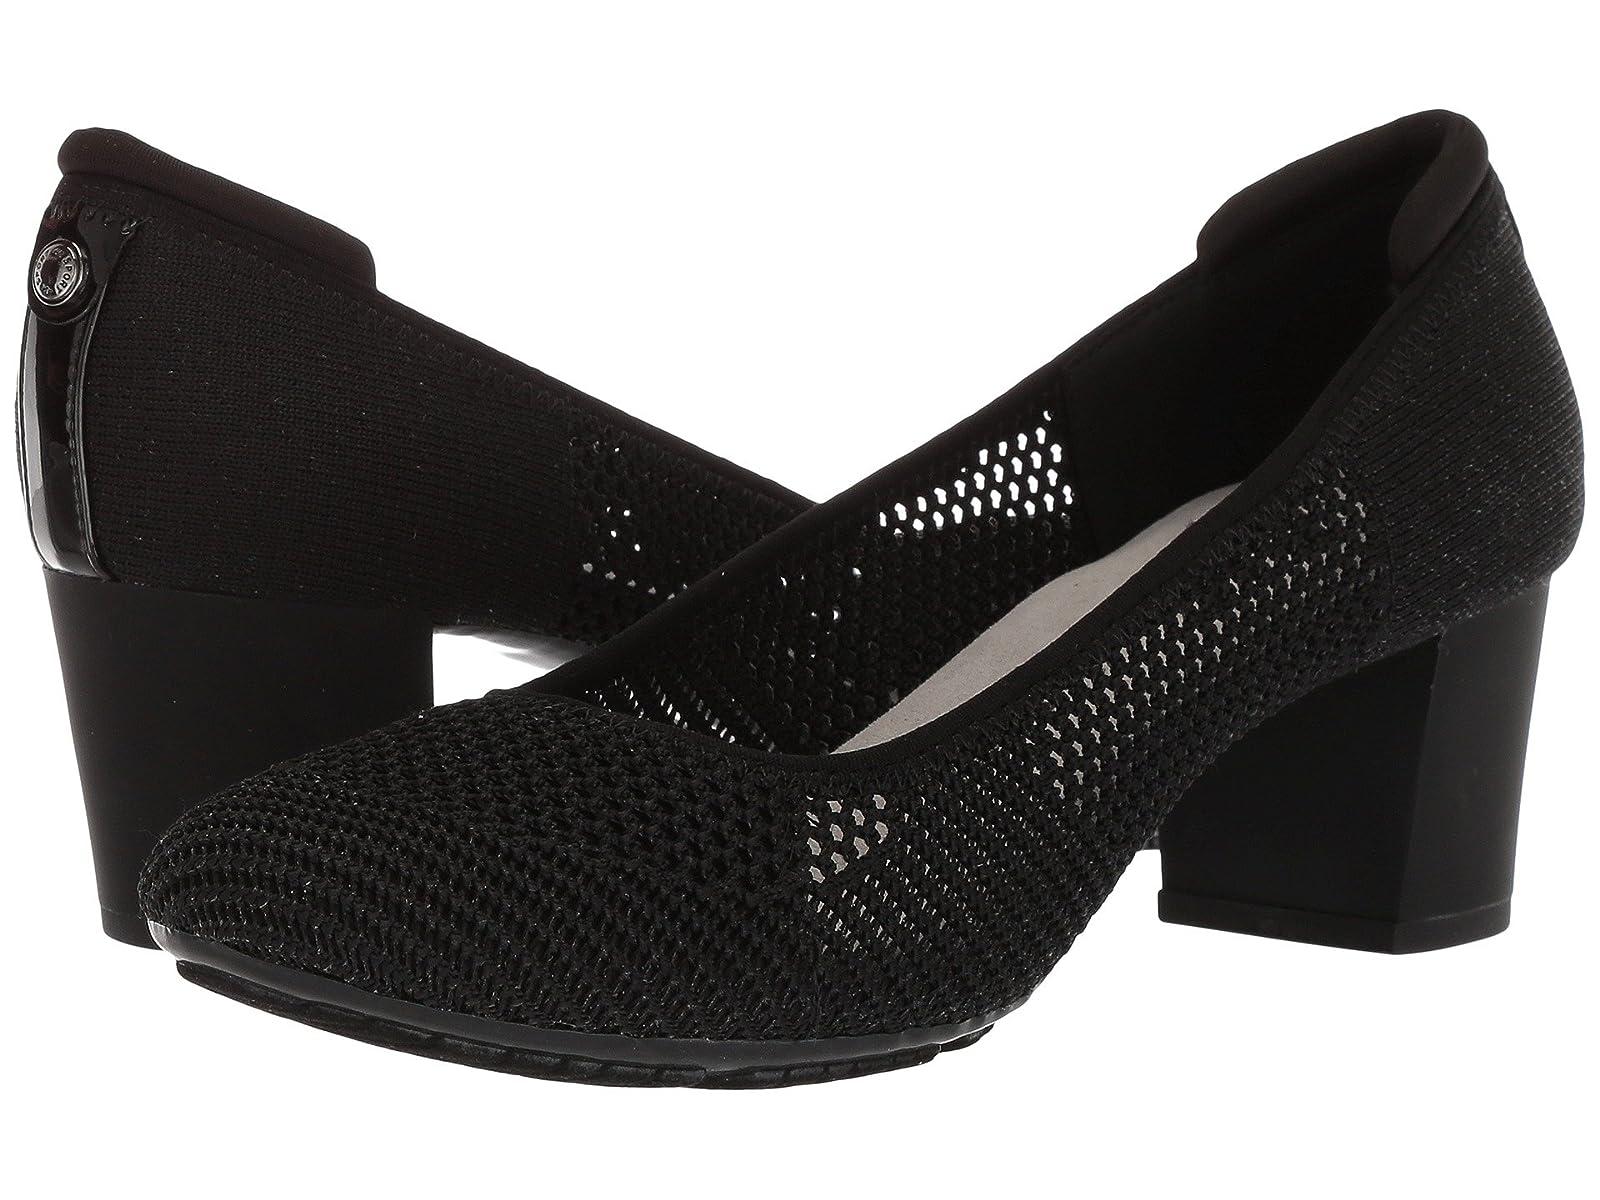 Anne Klein GenisaAtmospheric grades have affordable shoes